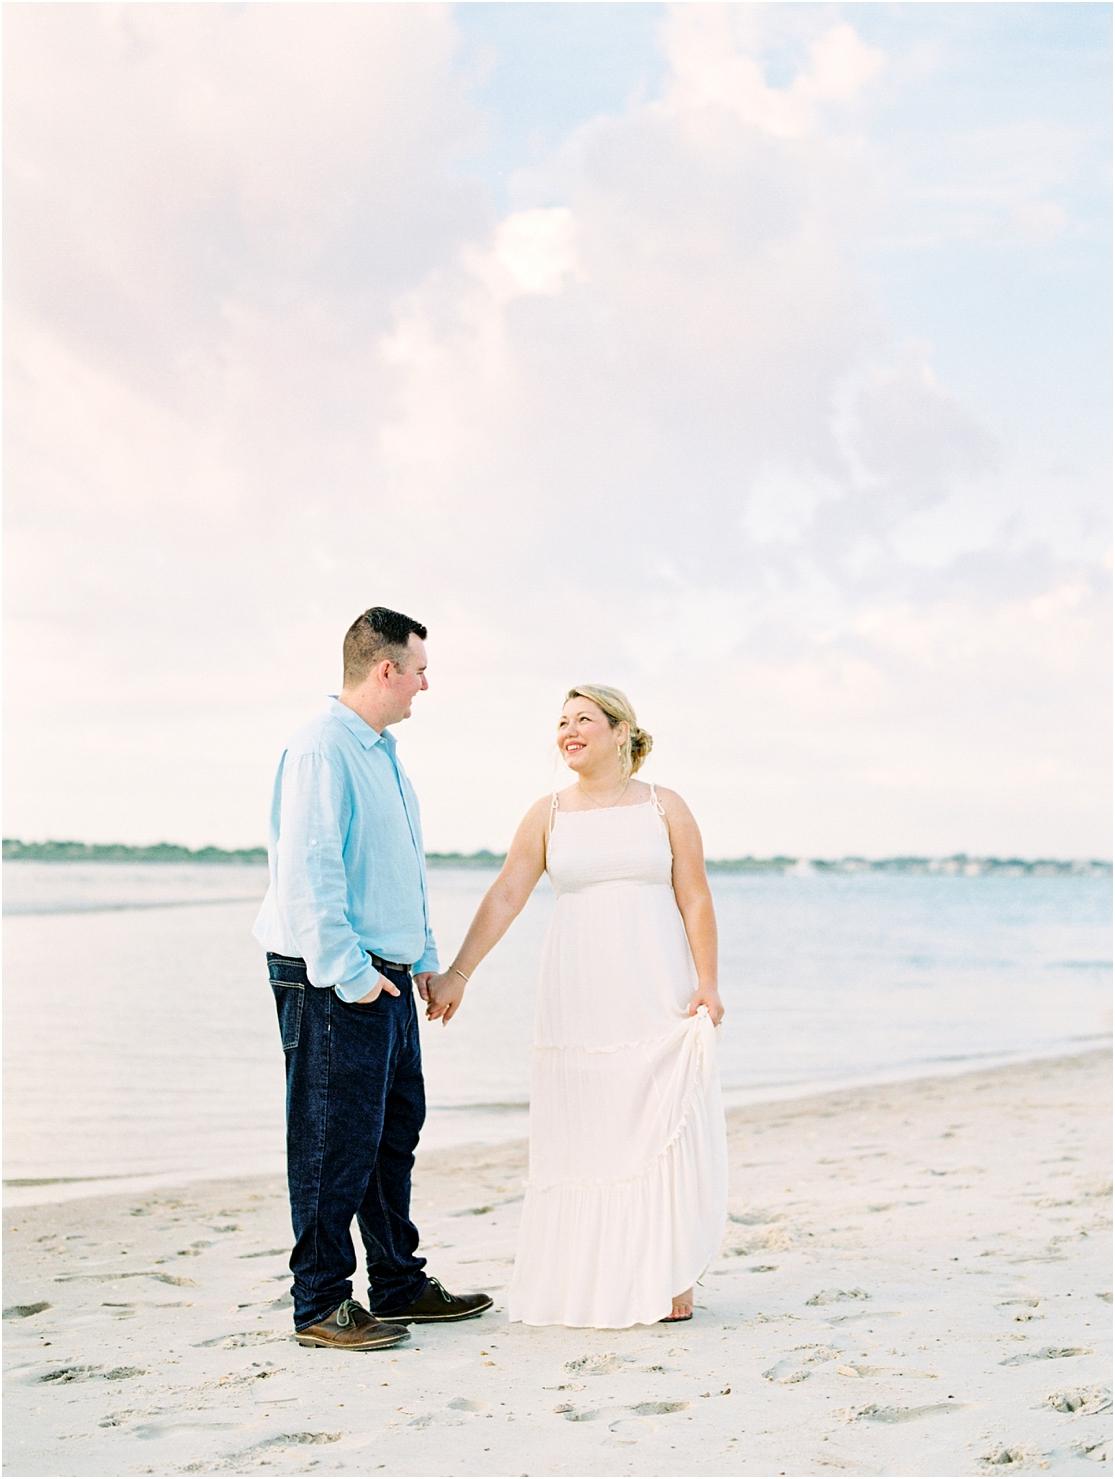 Lisa Silva Photography- Ponte Vedra Beach, St. Augustine and Jacksonville, Florida Fine Art Film Wedding Photography- Sunrise Engagement Session at  Vilano Beach_0004a.jpg